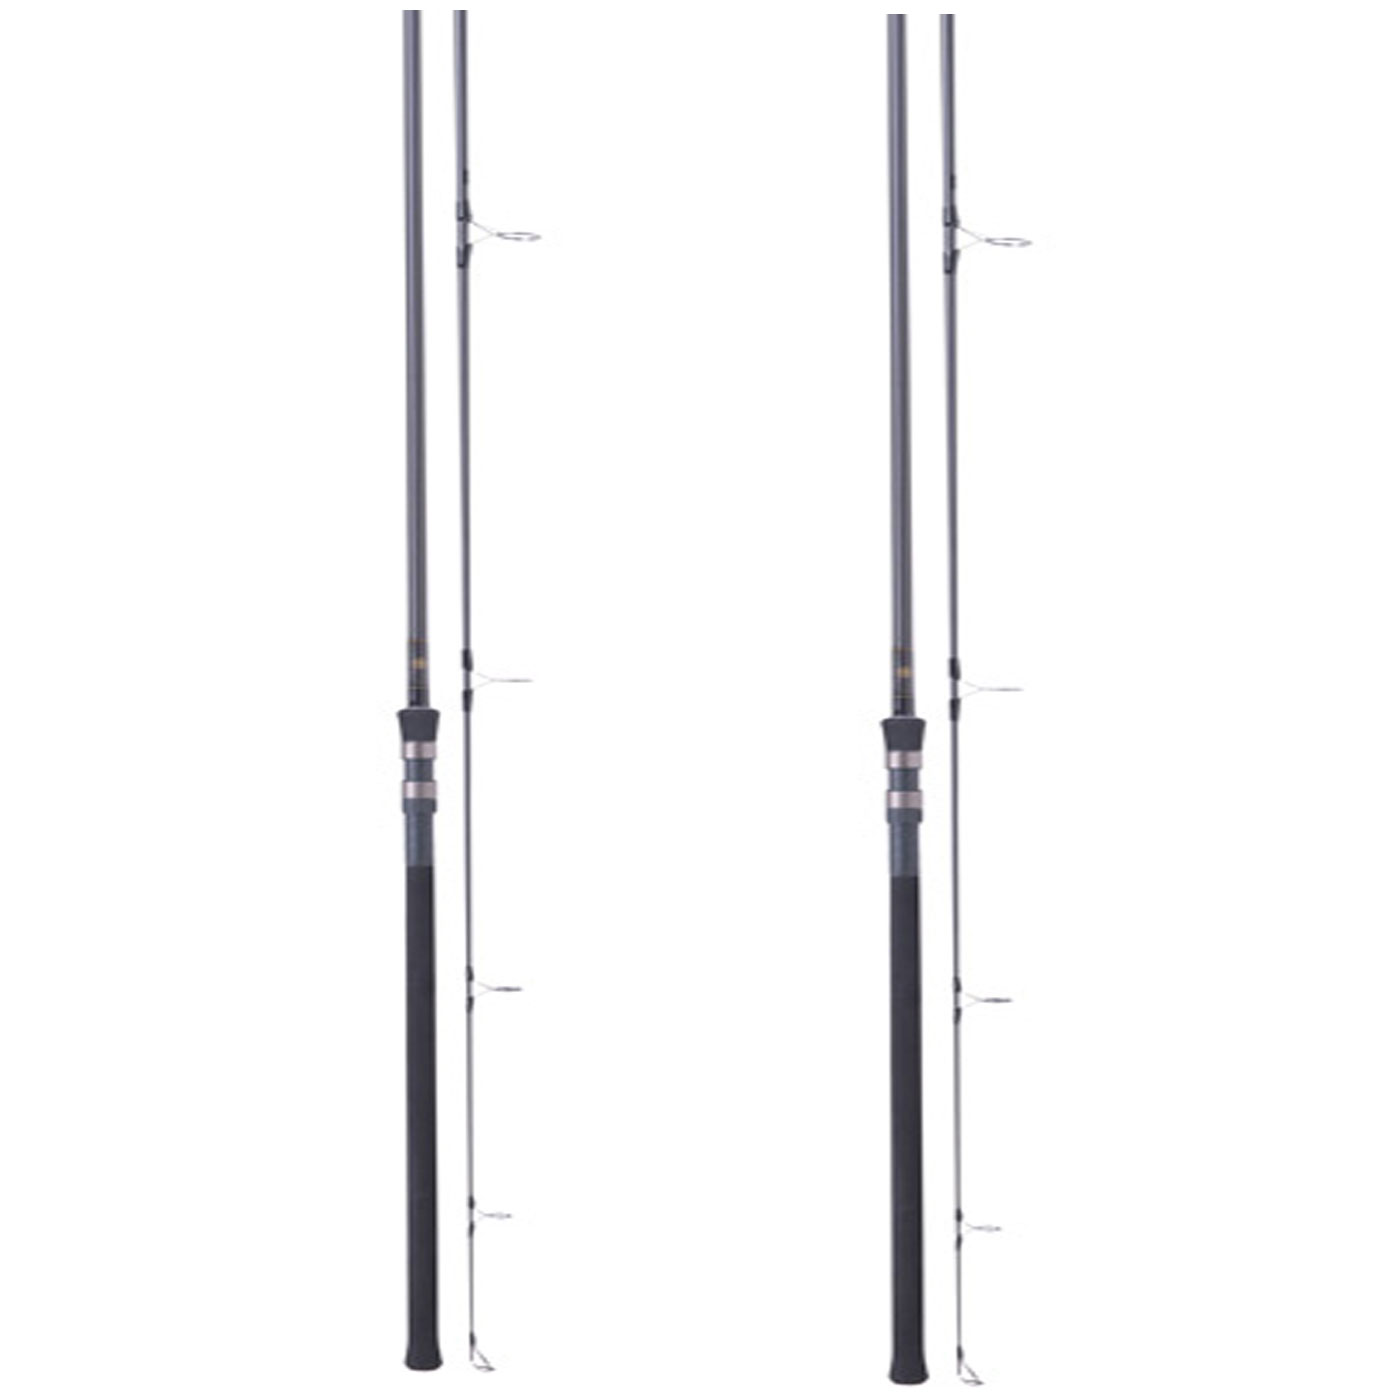 Wychwood Extremis FD 12ft 3.5lb T.C Full Slim Duplon Handle Rod -Set of 2-